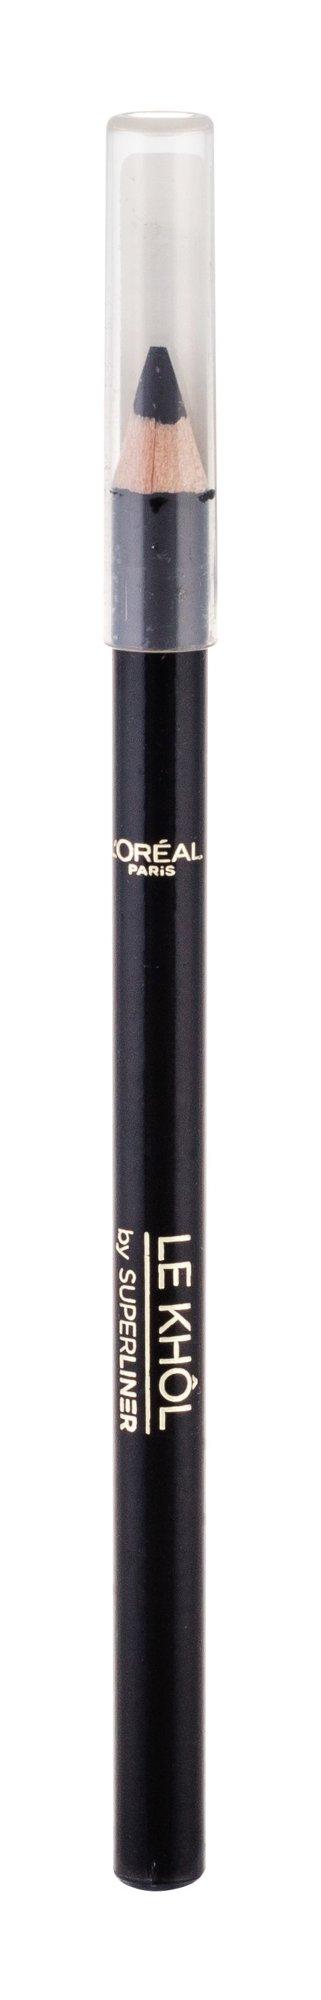 L´Oréal Paris Super Liner Cosmetic 1,2ml 101 Midnight Black